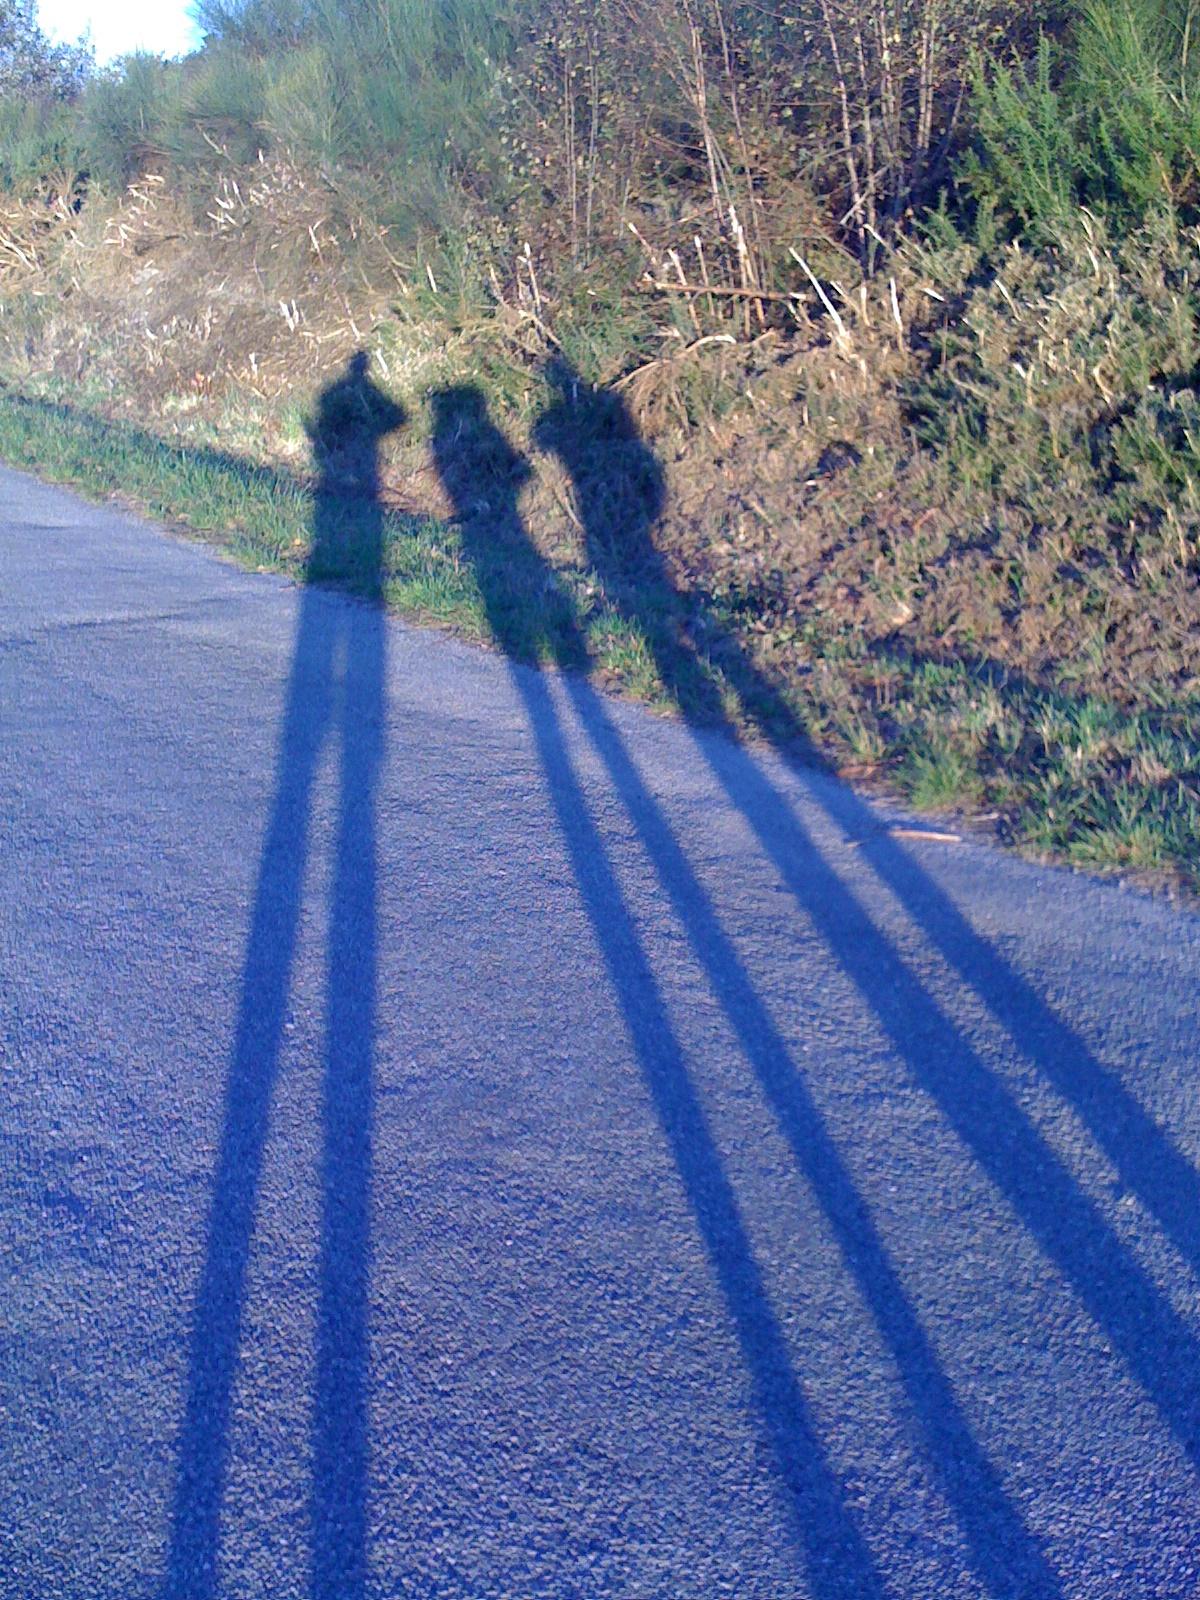 lange, lange Schatten